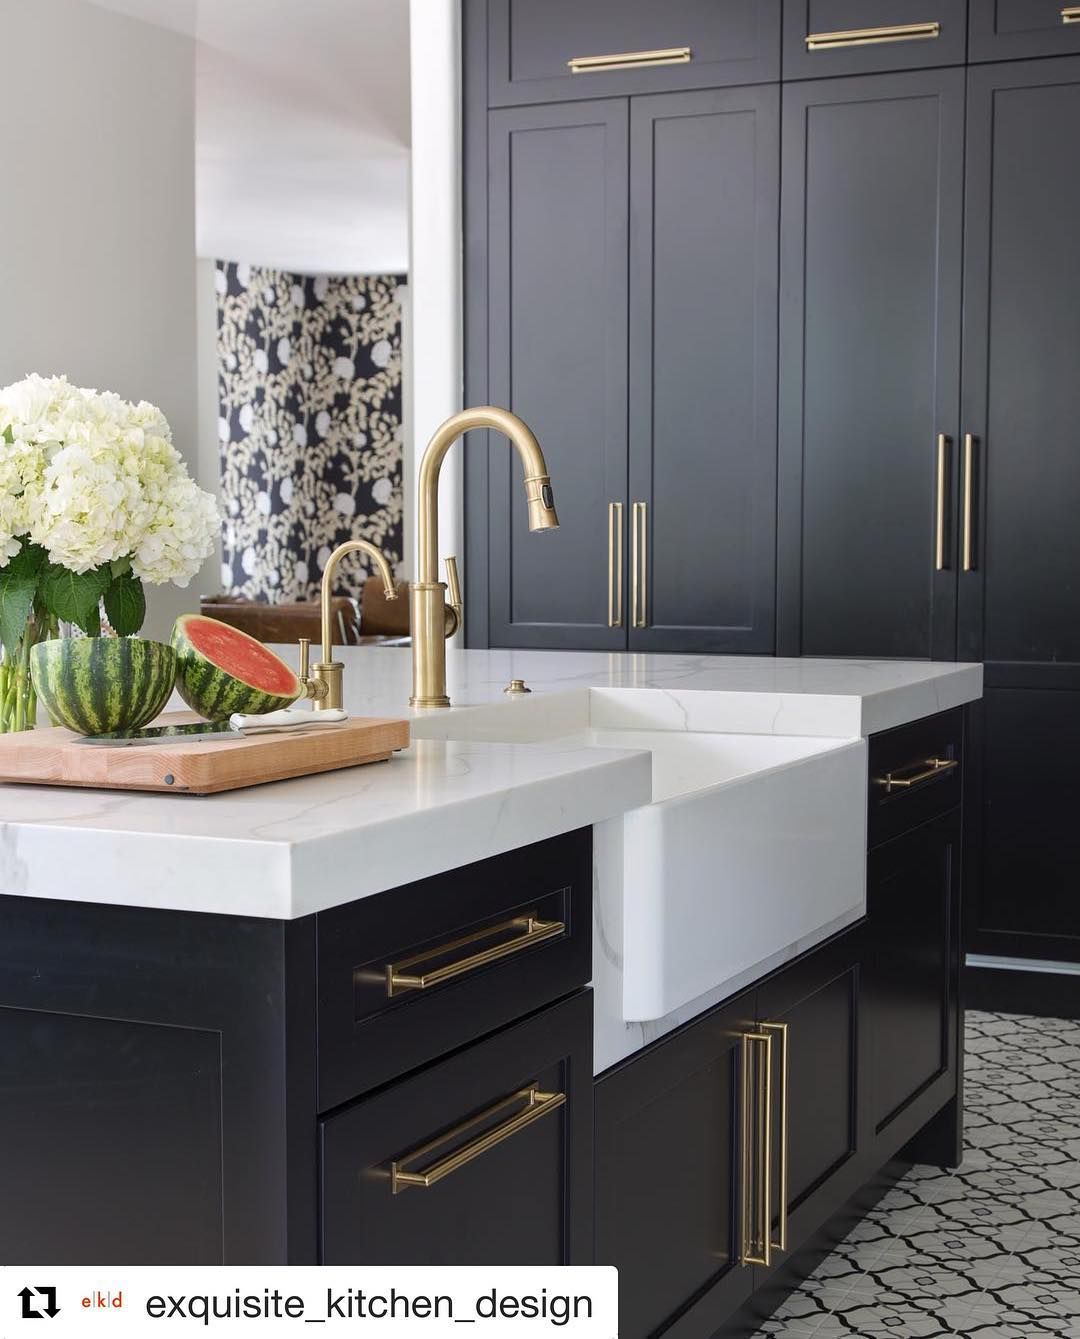 "outstanding designer kitchens inspired exquisite | Downsview Kitchens on Instagram: ""#Repost @exquisite ..."